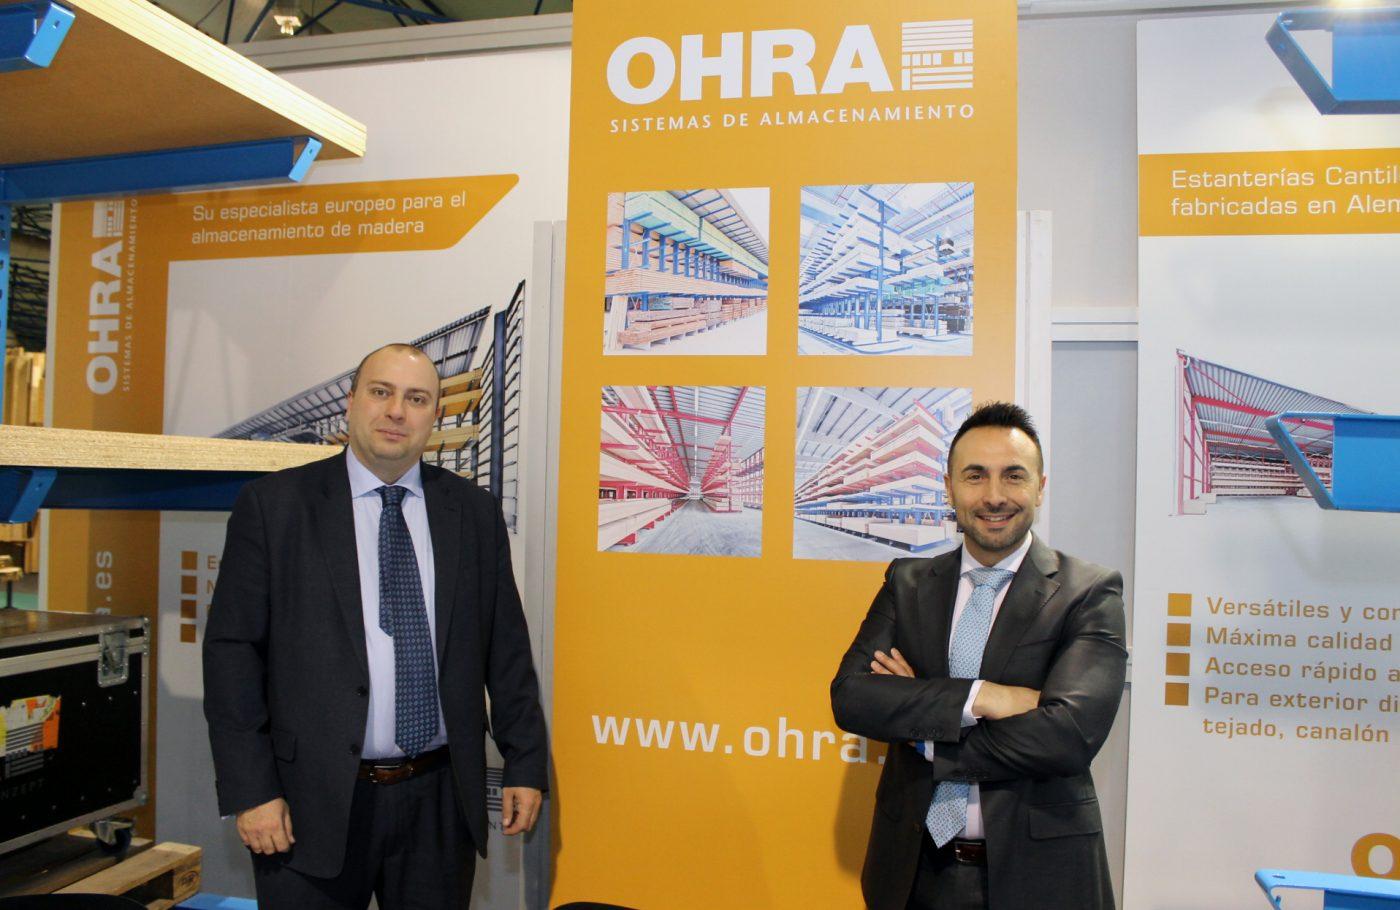 Éxito de OHRA en FIMMA-Maderalia